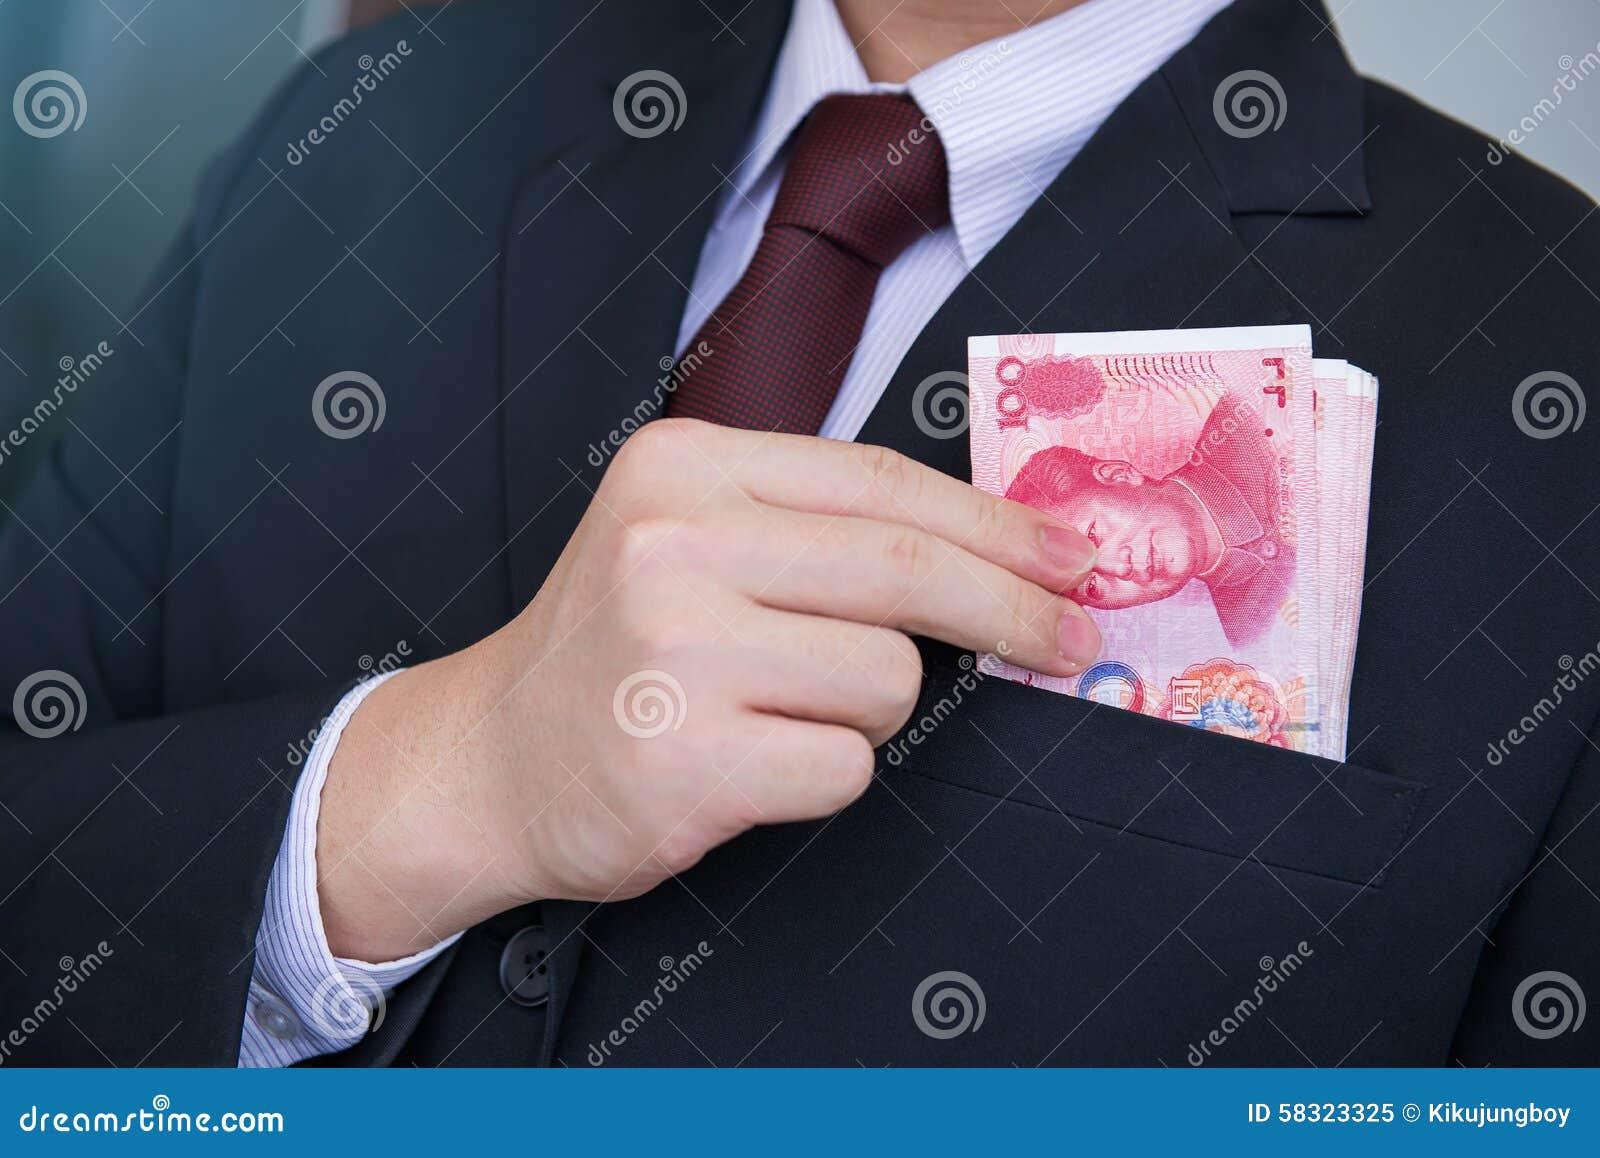 Rmb валюта кризис 2011 как форекс